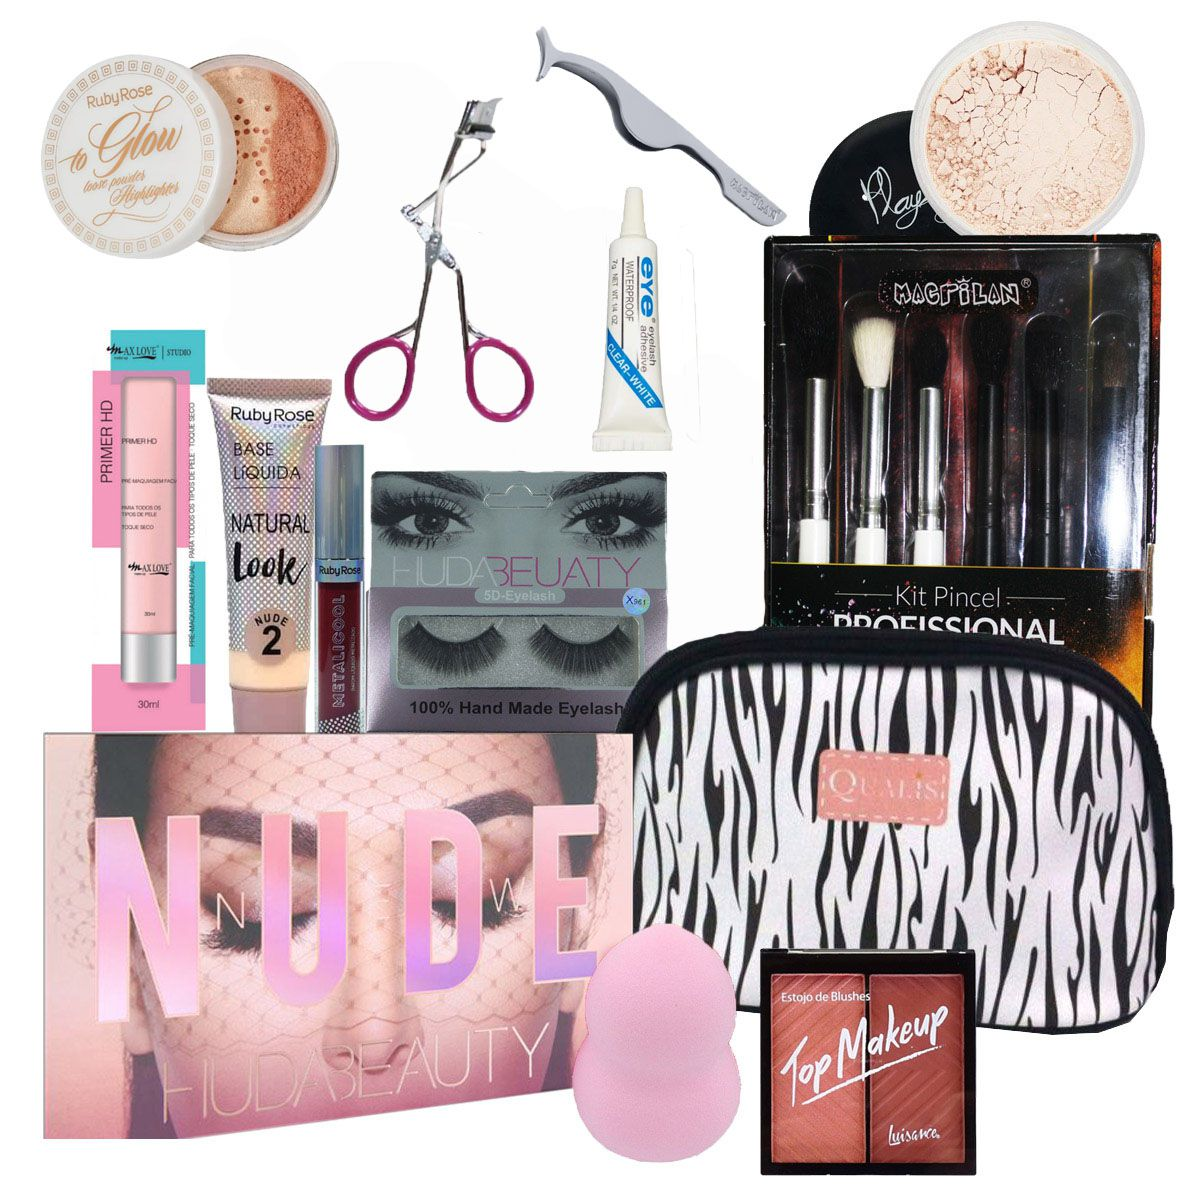 Kit Maquiagem Completo Profissional 13 Produtos - Huda Beauty